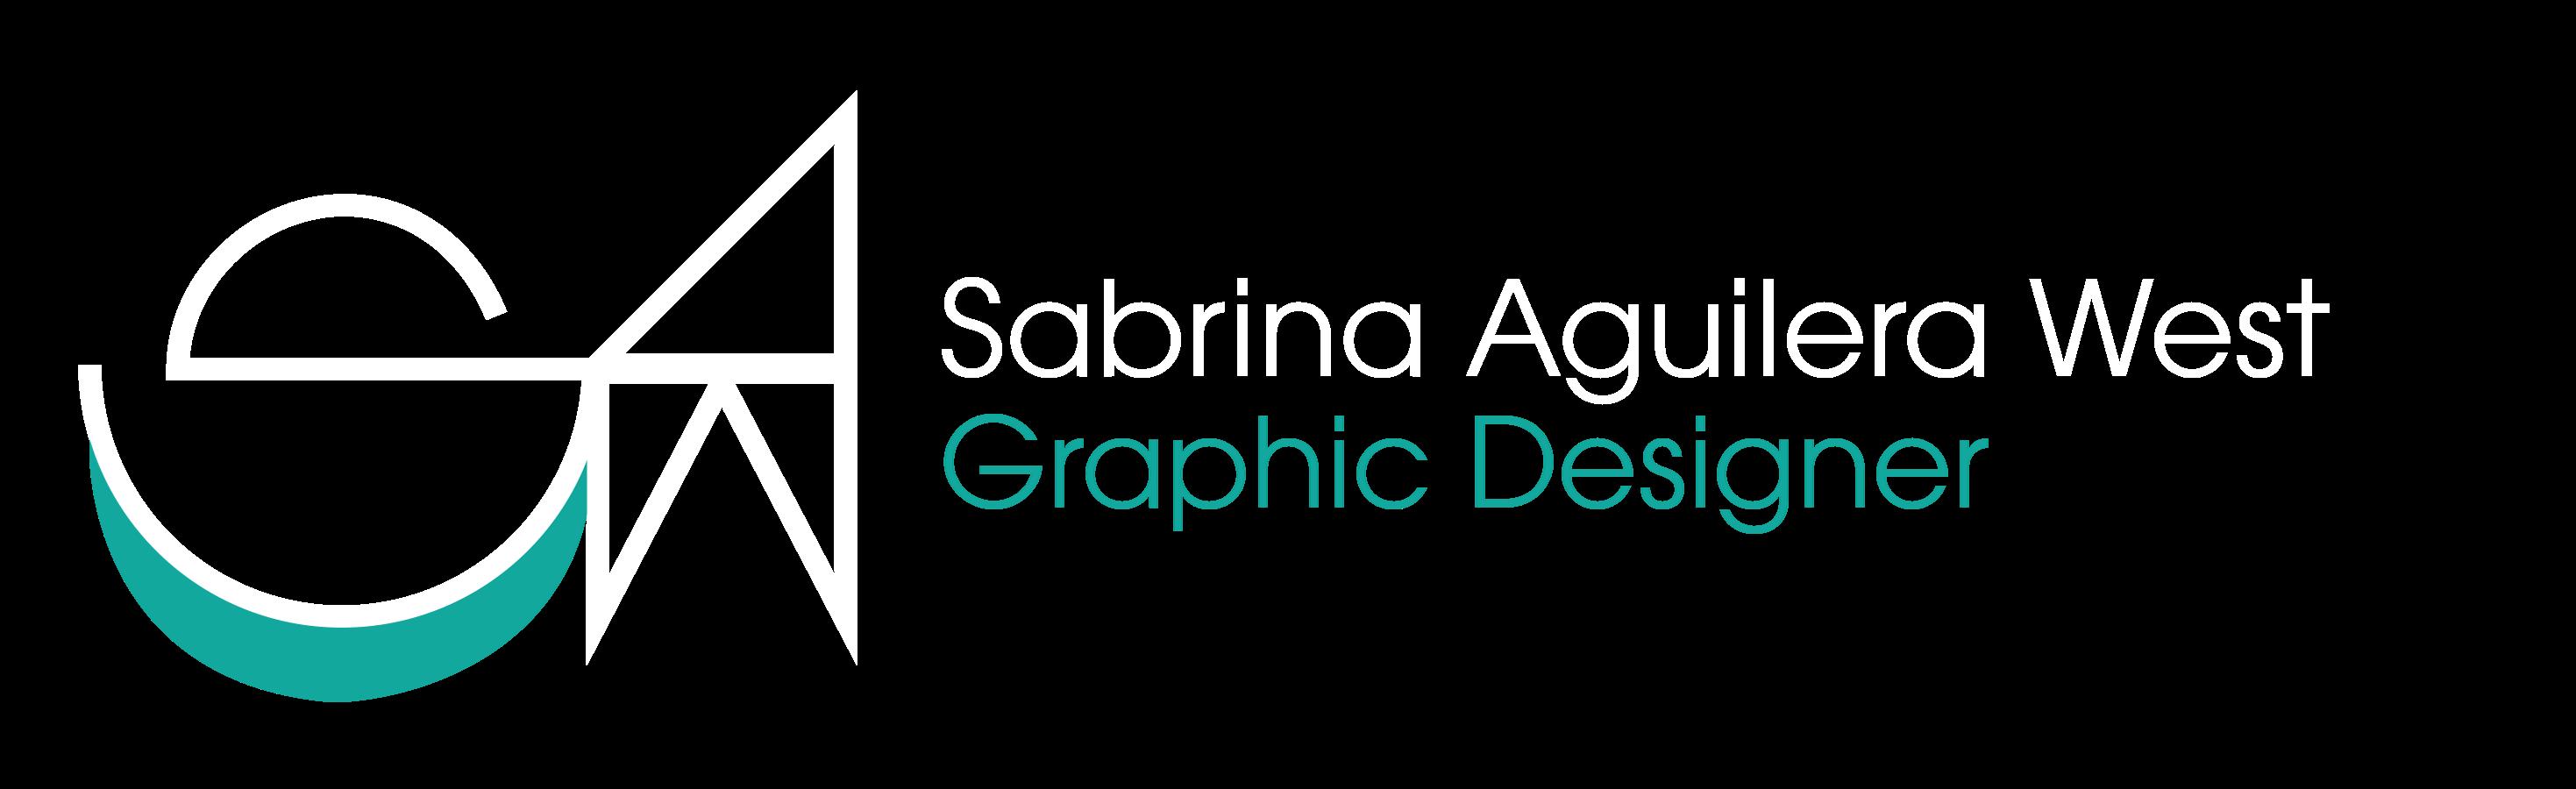 Sabrina Aguilera West